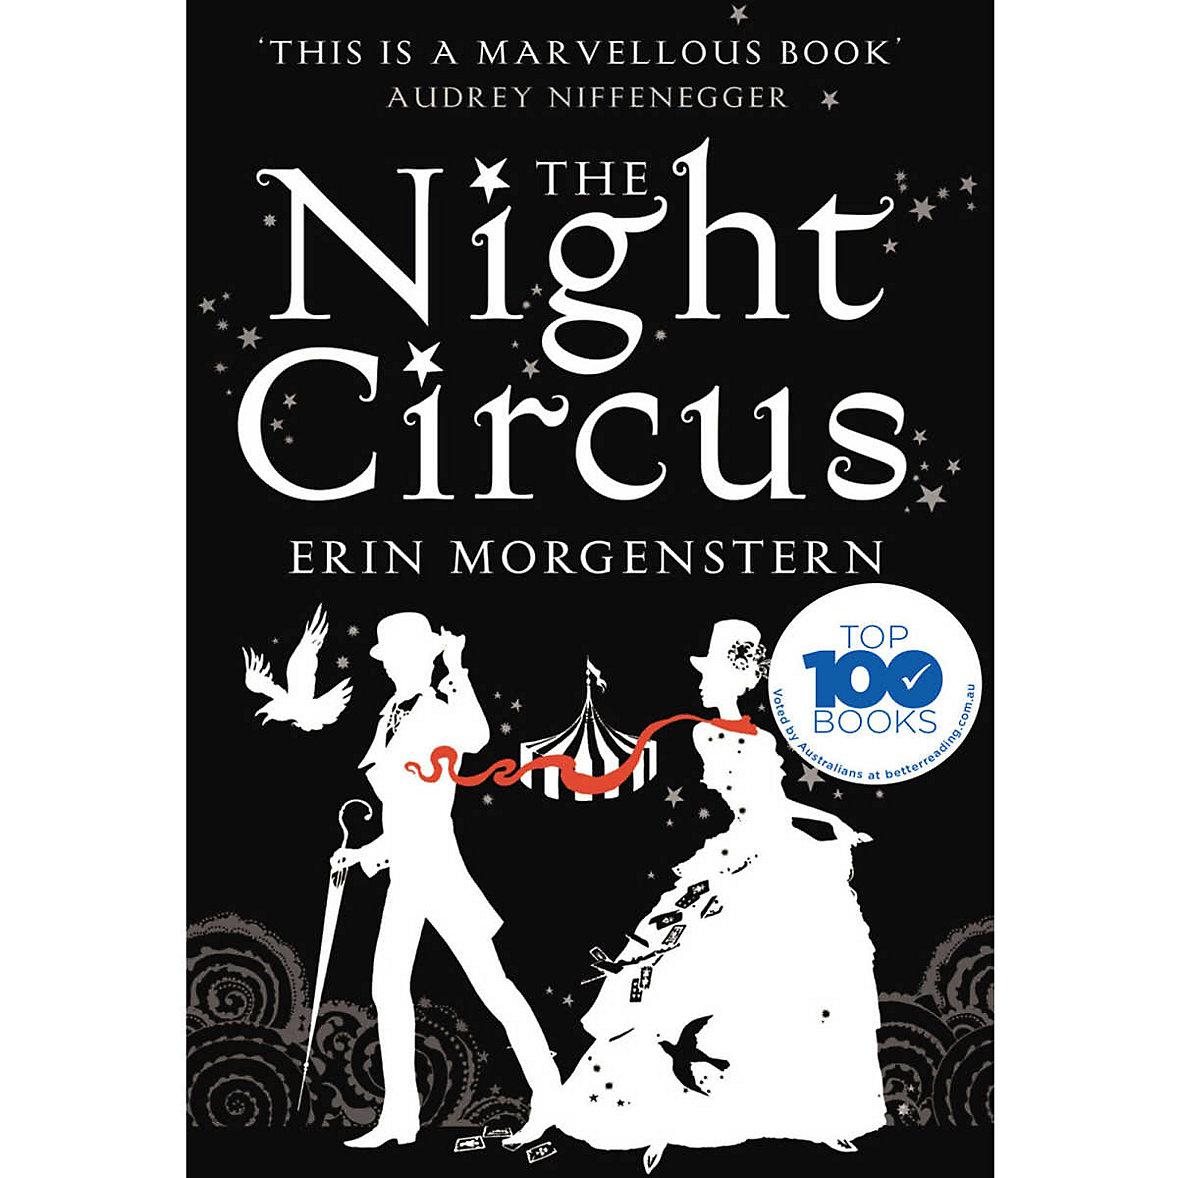 The Night Circus - Erin Morgernstern